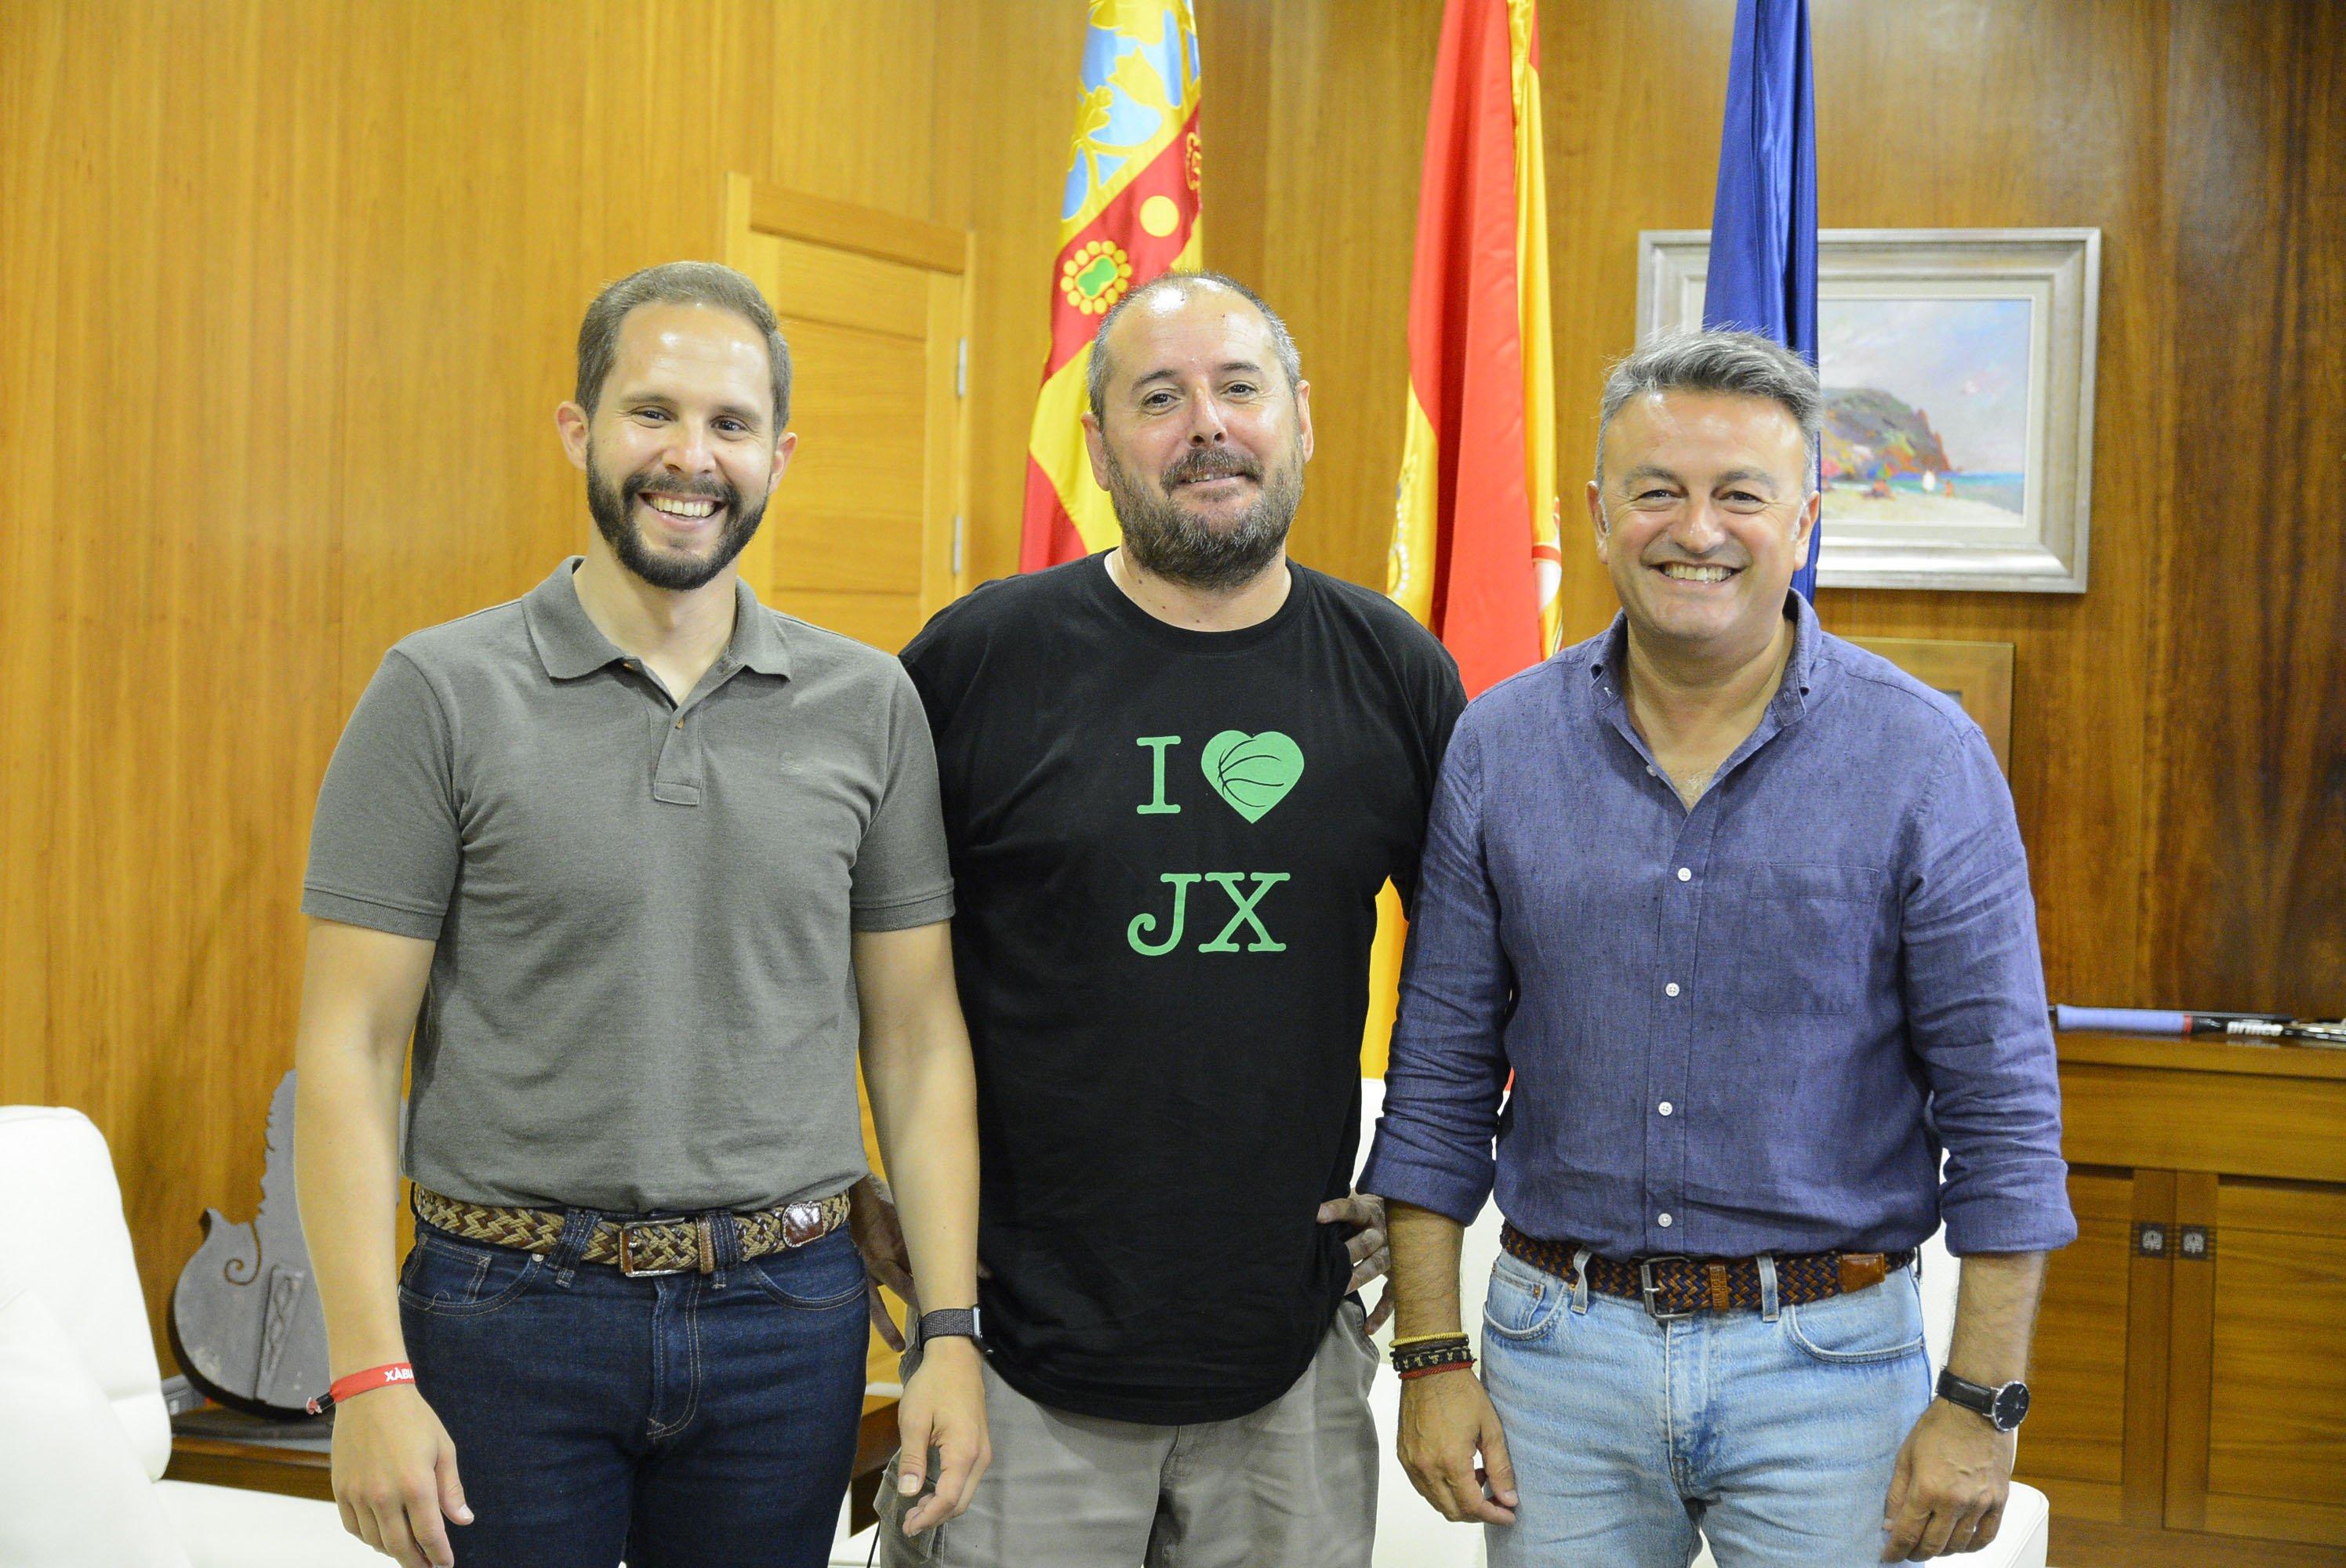 Club de Bàsquet Joventut Xàbia